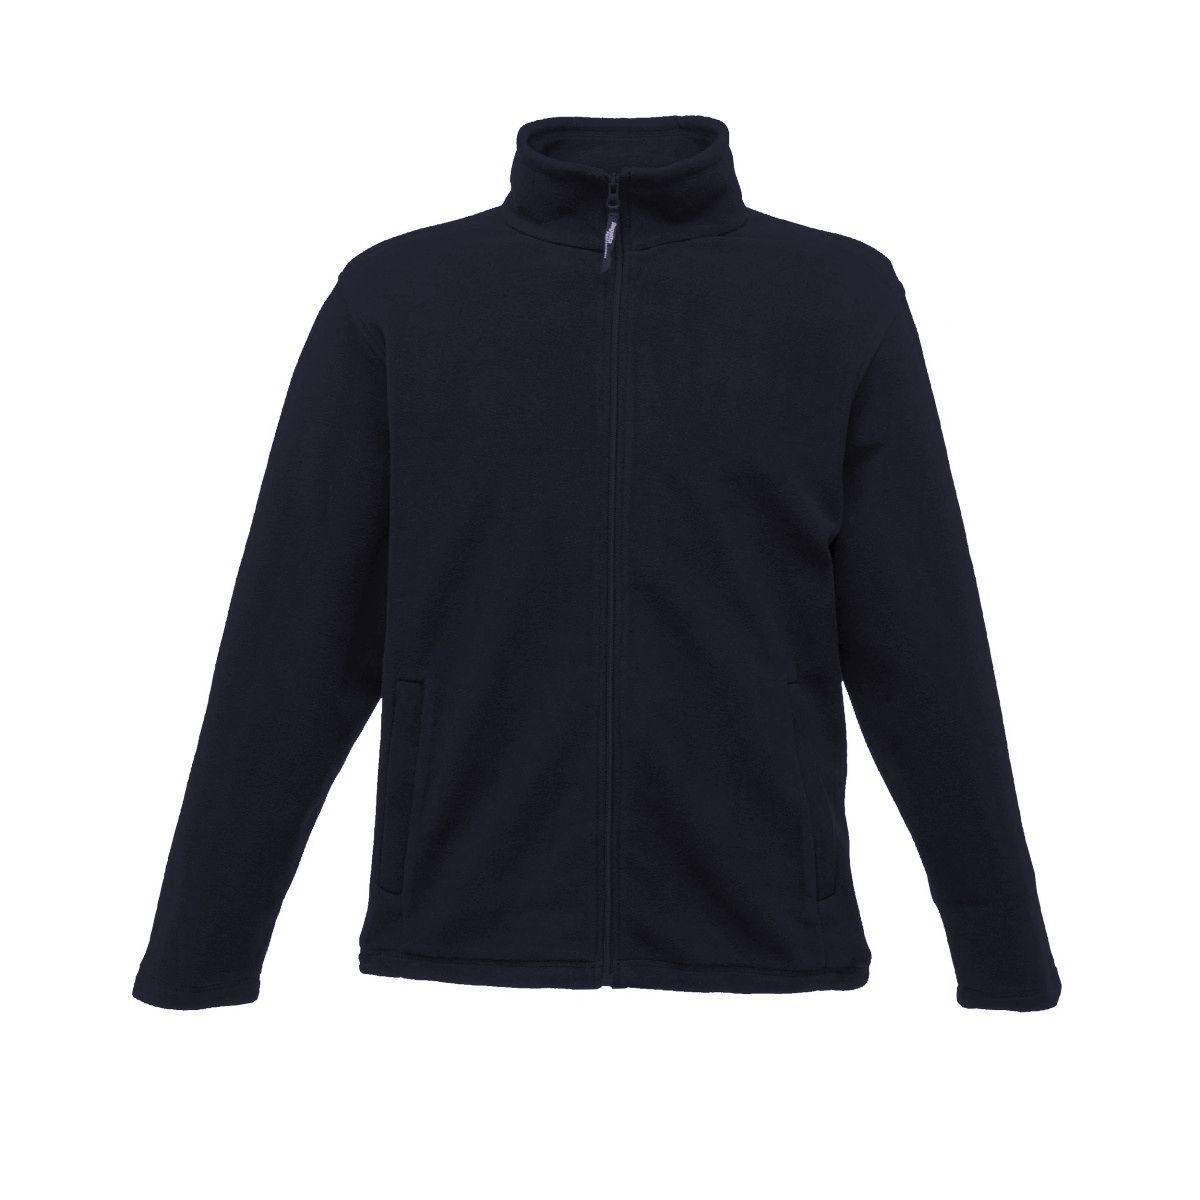 Regatta Mens Plain Micro Fleece Full Zip Jacket (Layer Lite)